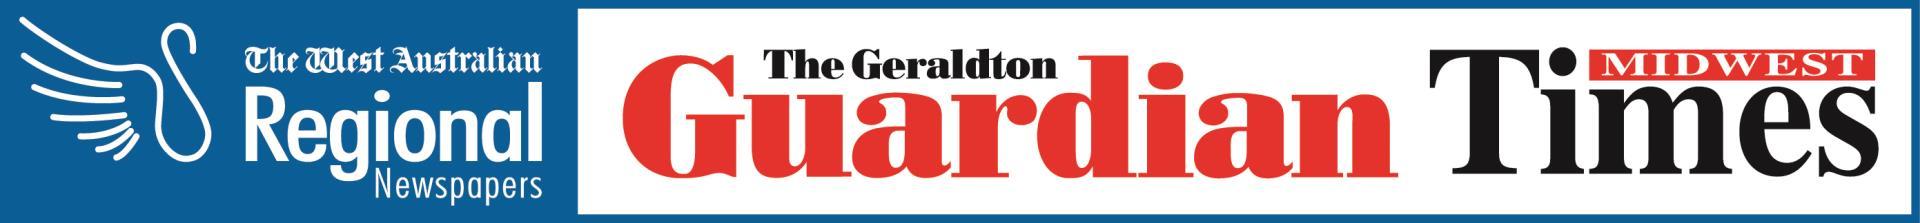 Geraldton Guardian